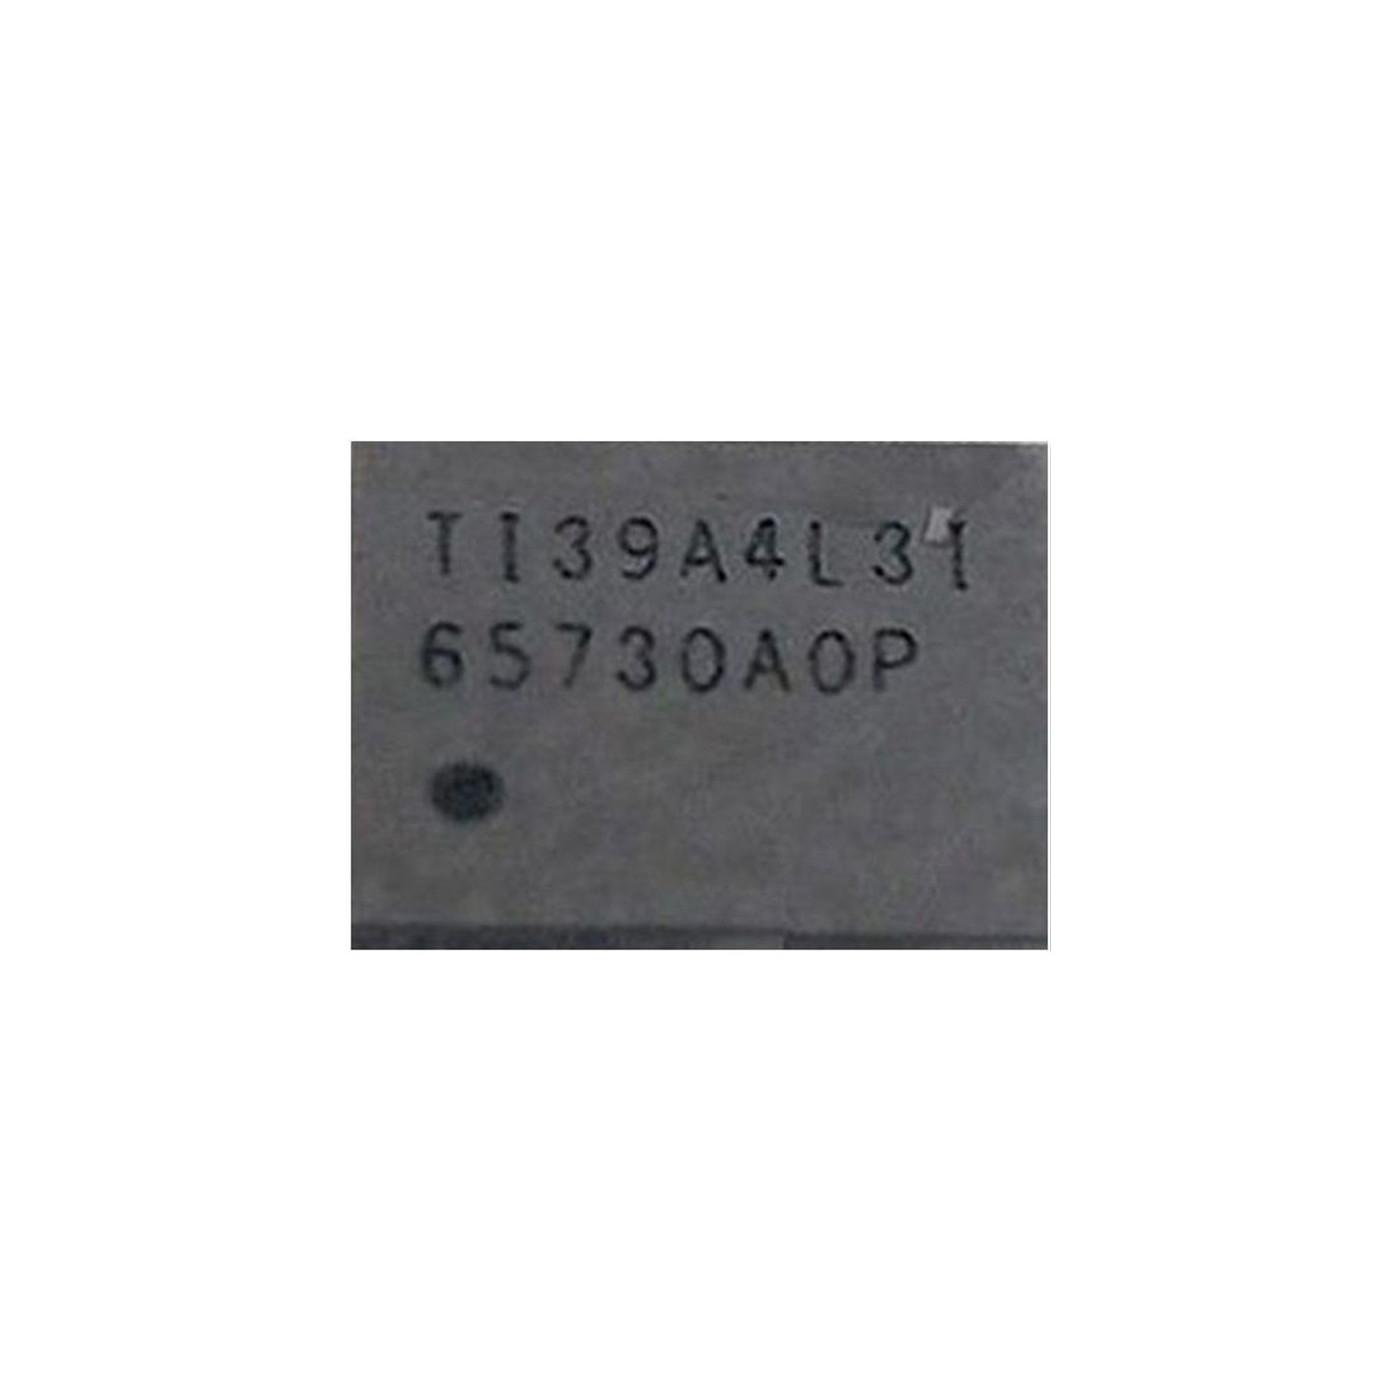 IC CHIP DISPLAY U1501 20 PIN 65730A0P PER APPLE IPHONE 6 - 6 PLUS - 7 - 7 PLUS